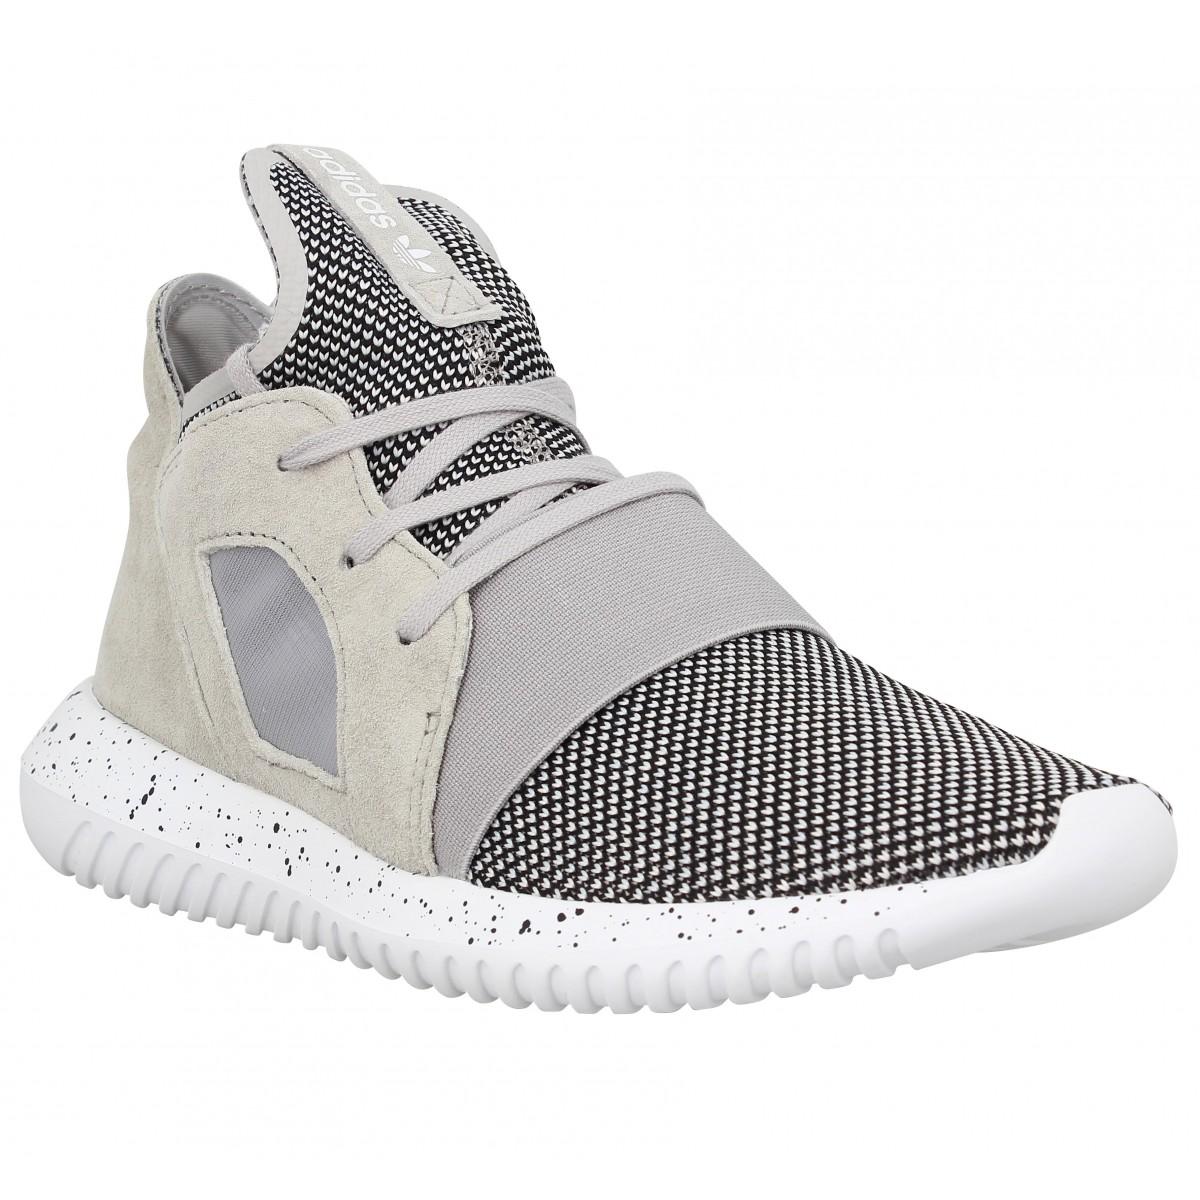 Adidas Femme Tubular Defiant -40-granit